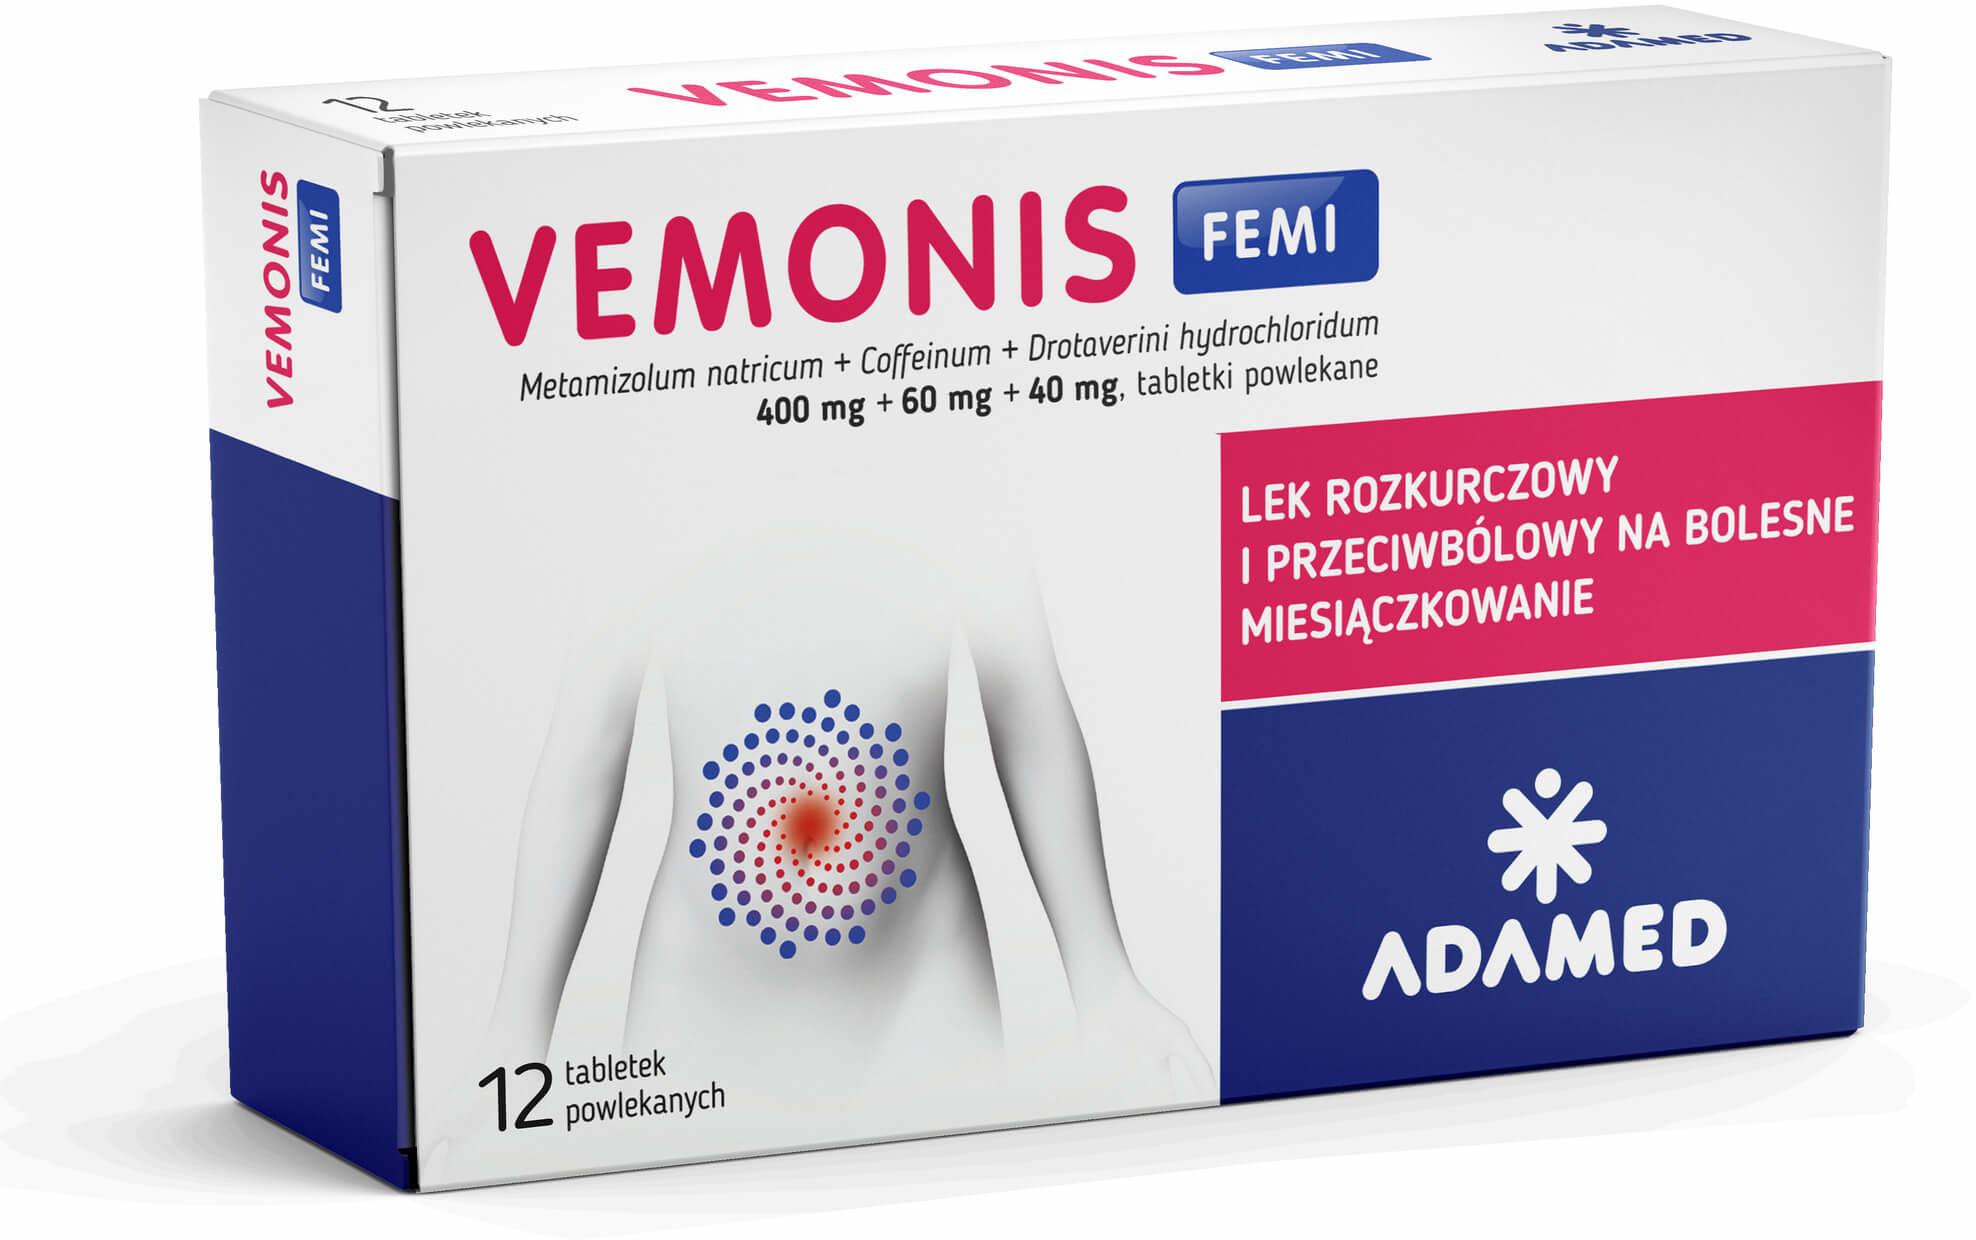 ADAMED Vemonis Femi x 12 tabl | DARMOWA DOSTAWA OD 199 PLN!